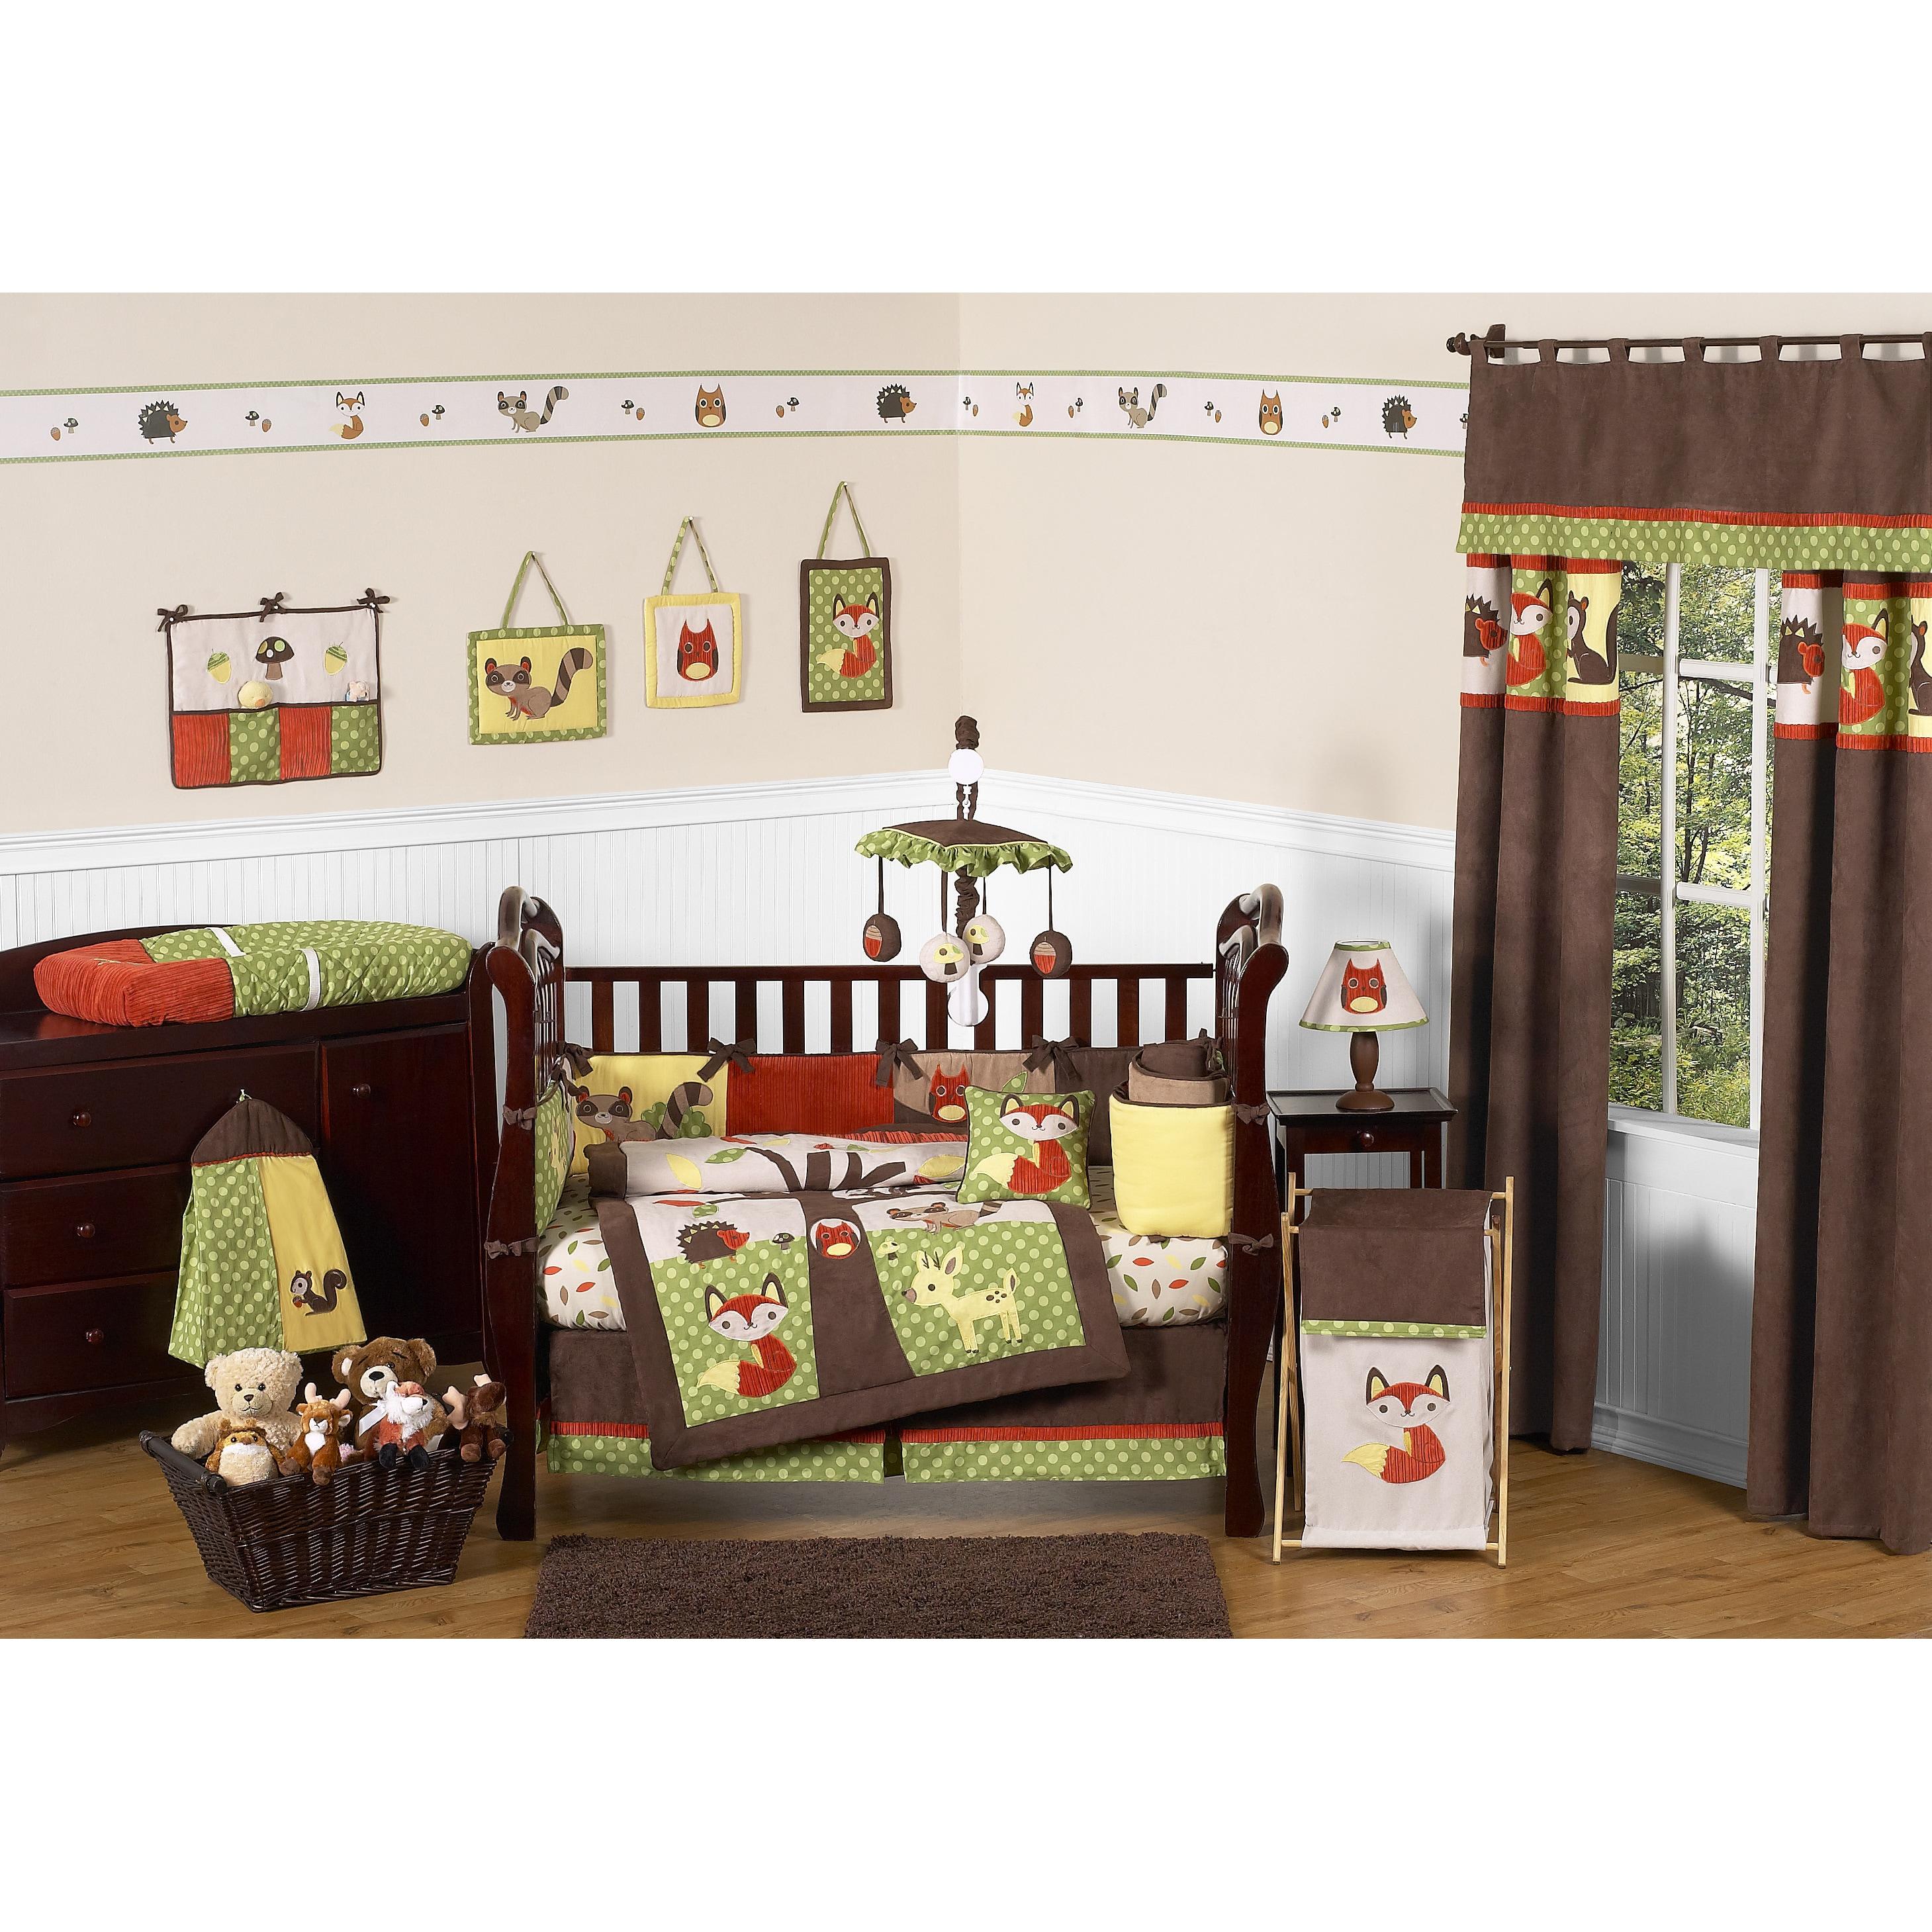 ladybug s p baby jojo sweet black cribs bedding crib girls bumperless set red of designs picture